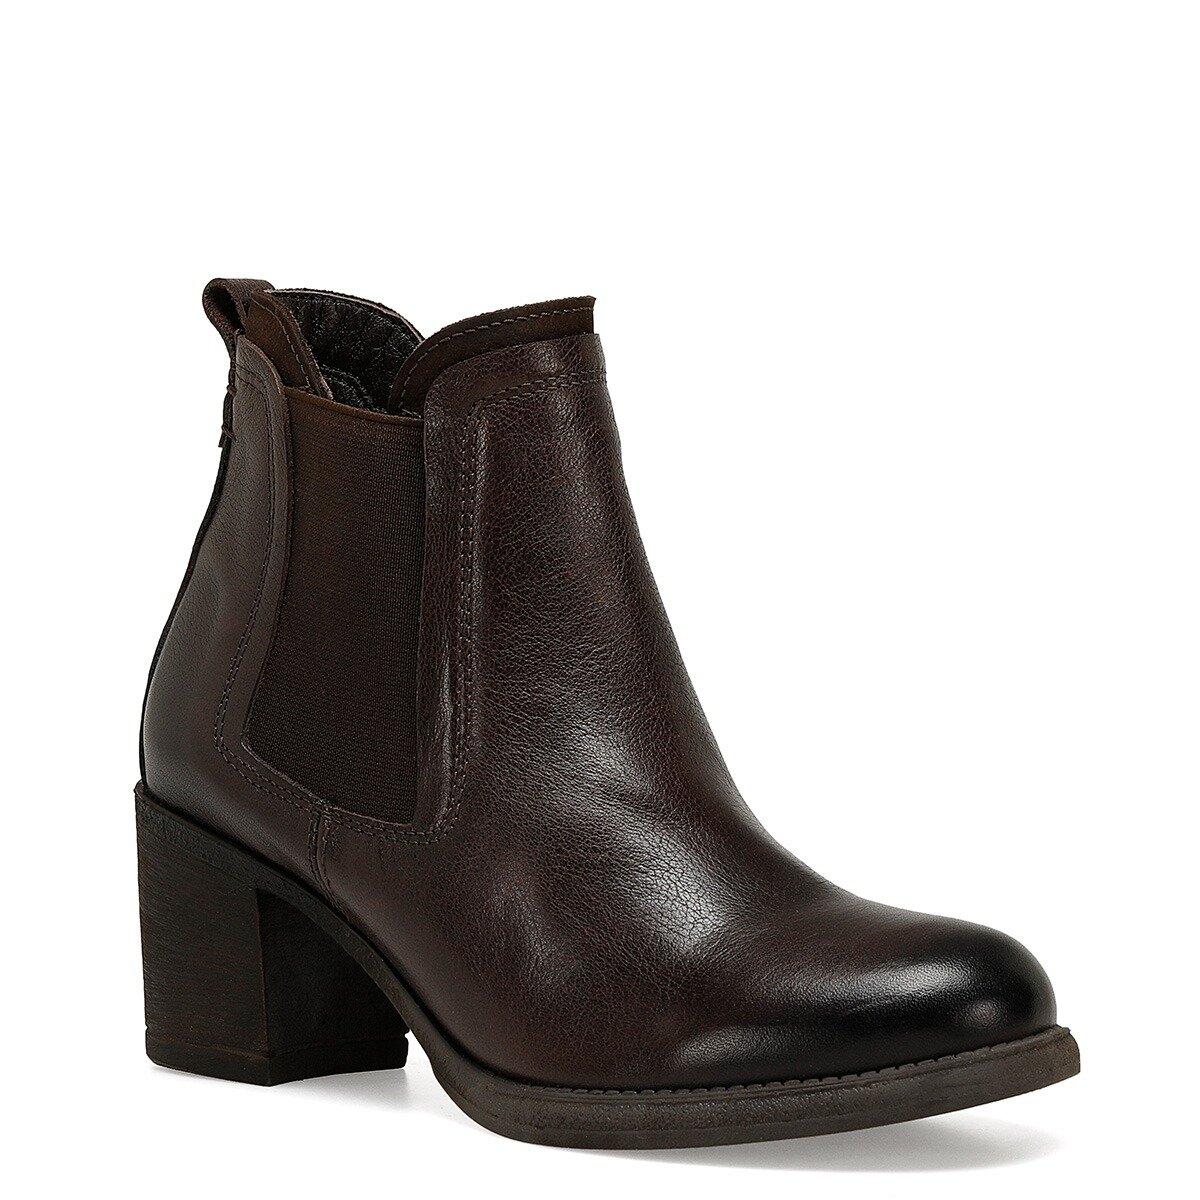 BOLDA Kahverengi Kadın Topuklu Bot